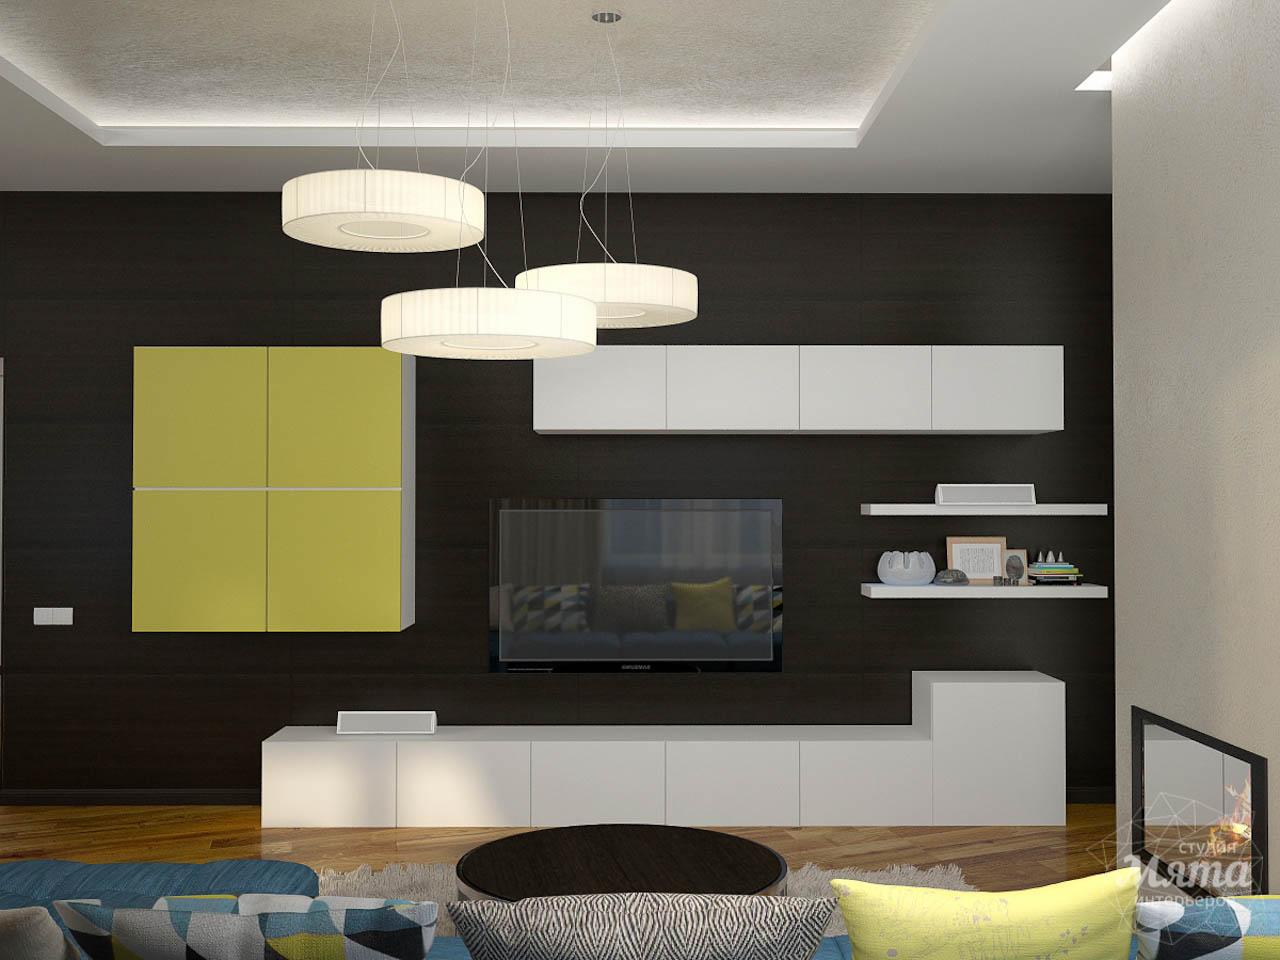 Дизайн проект интерьера коттеджа  в стиле минимализм по ул. Барвинка 15 img580772540